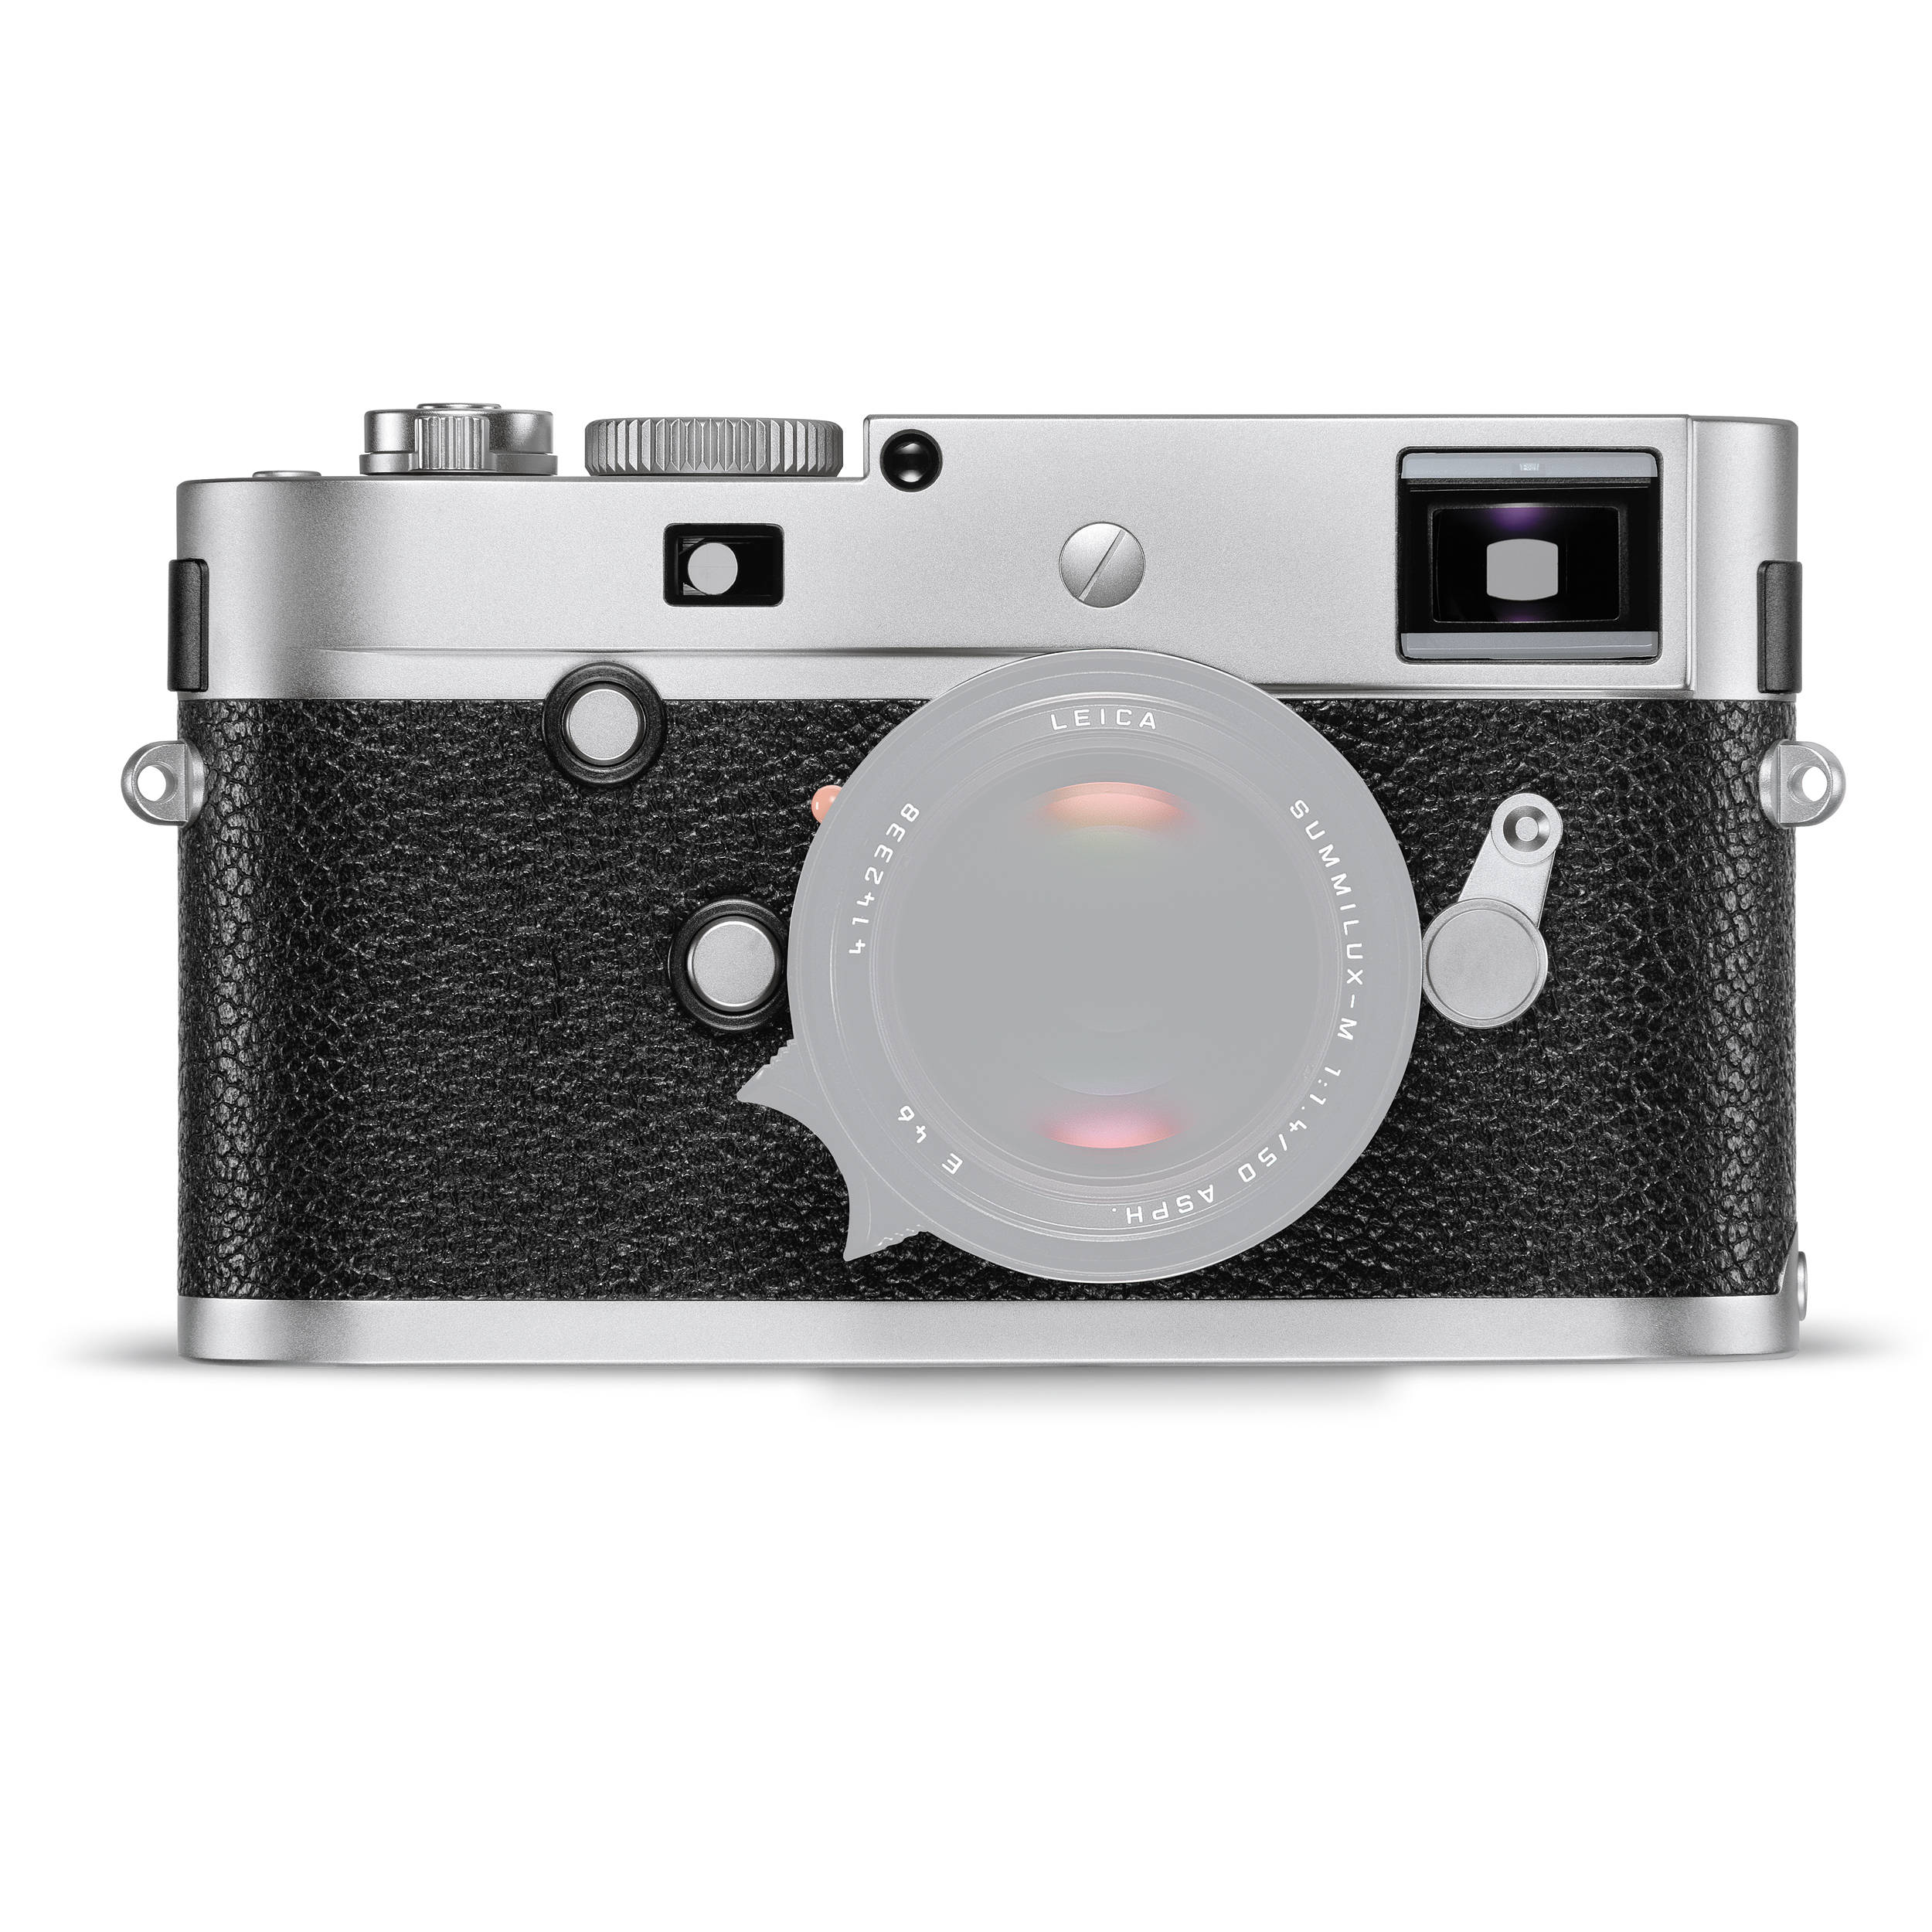 Leica M P Typ 240 Digital Rangefinder Camera 10772 B Amp H Photo